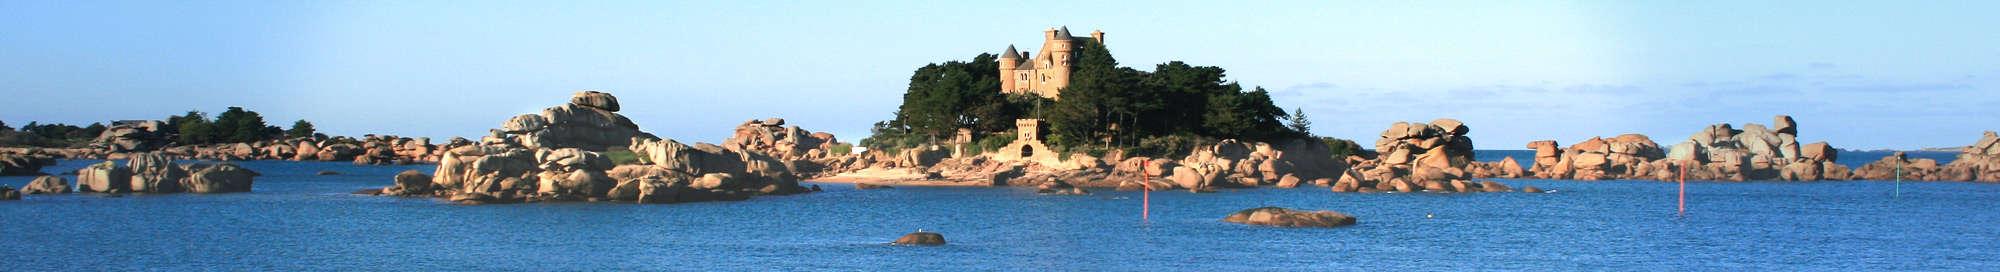 Week-end et séjour en Bretagne